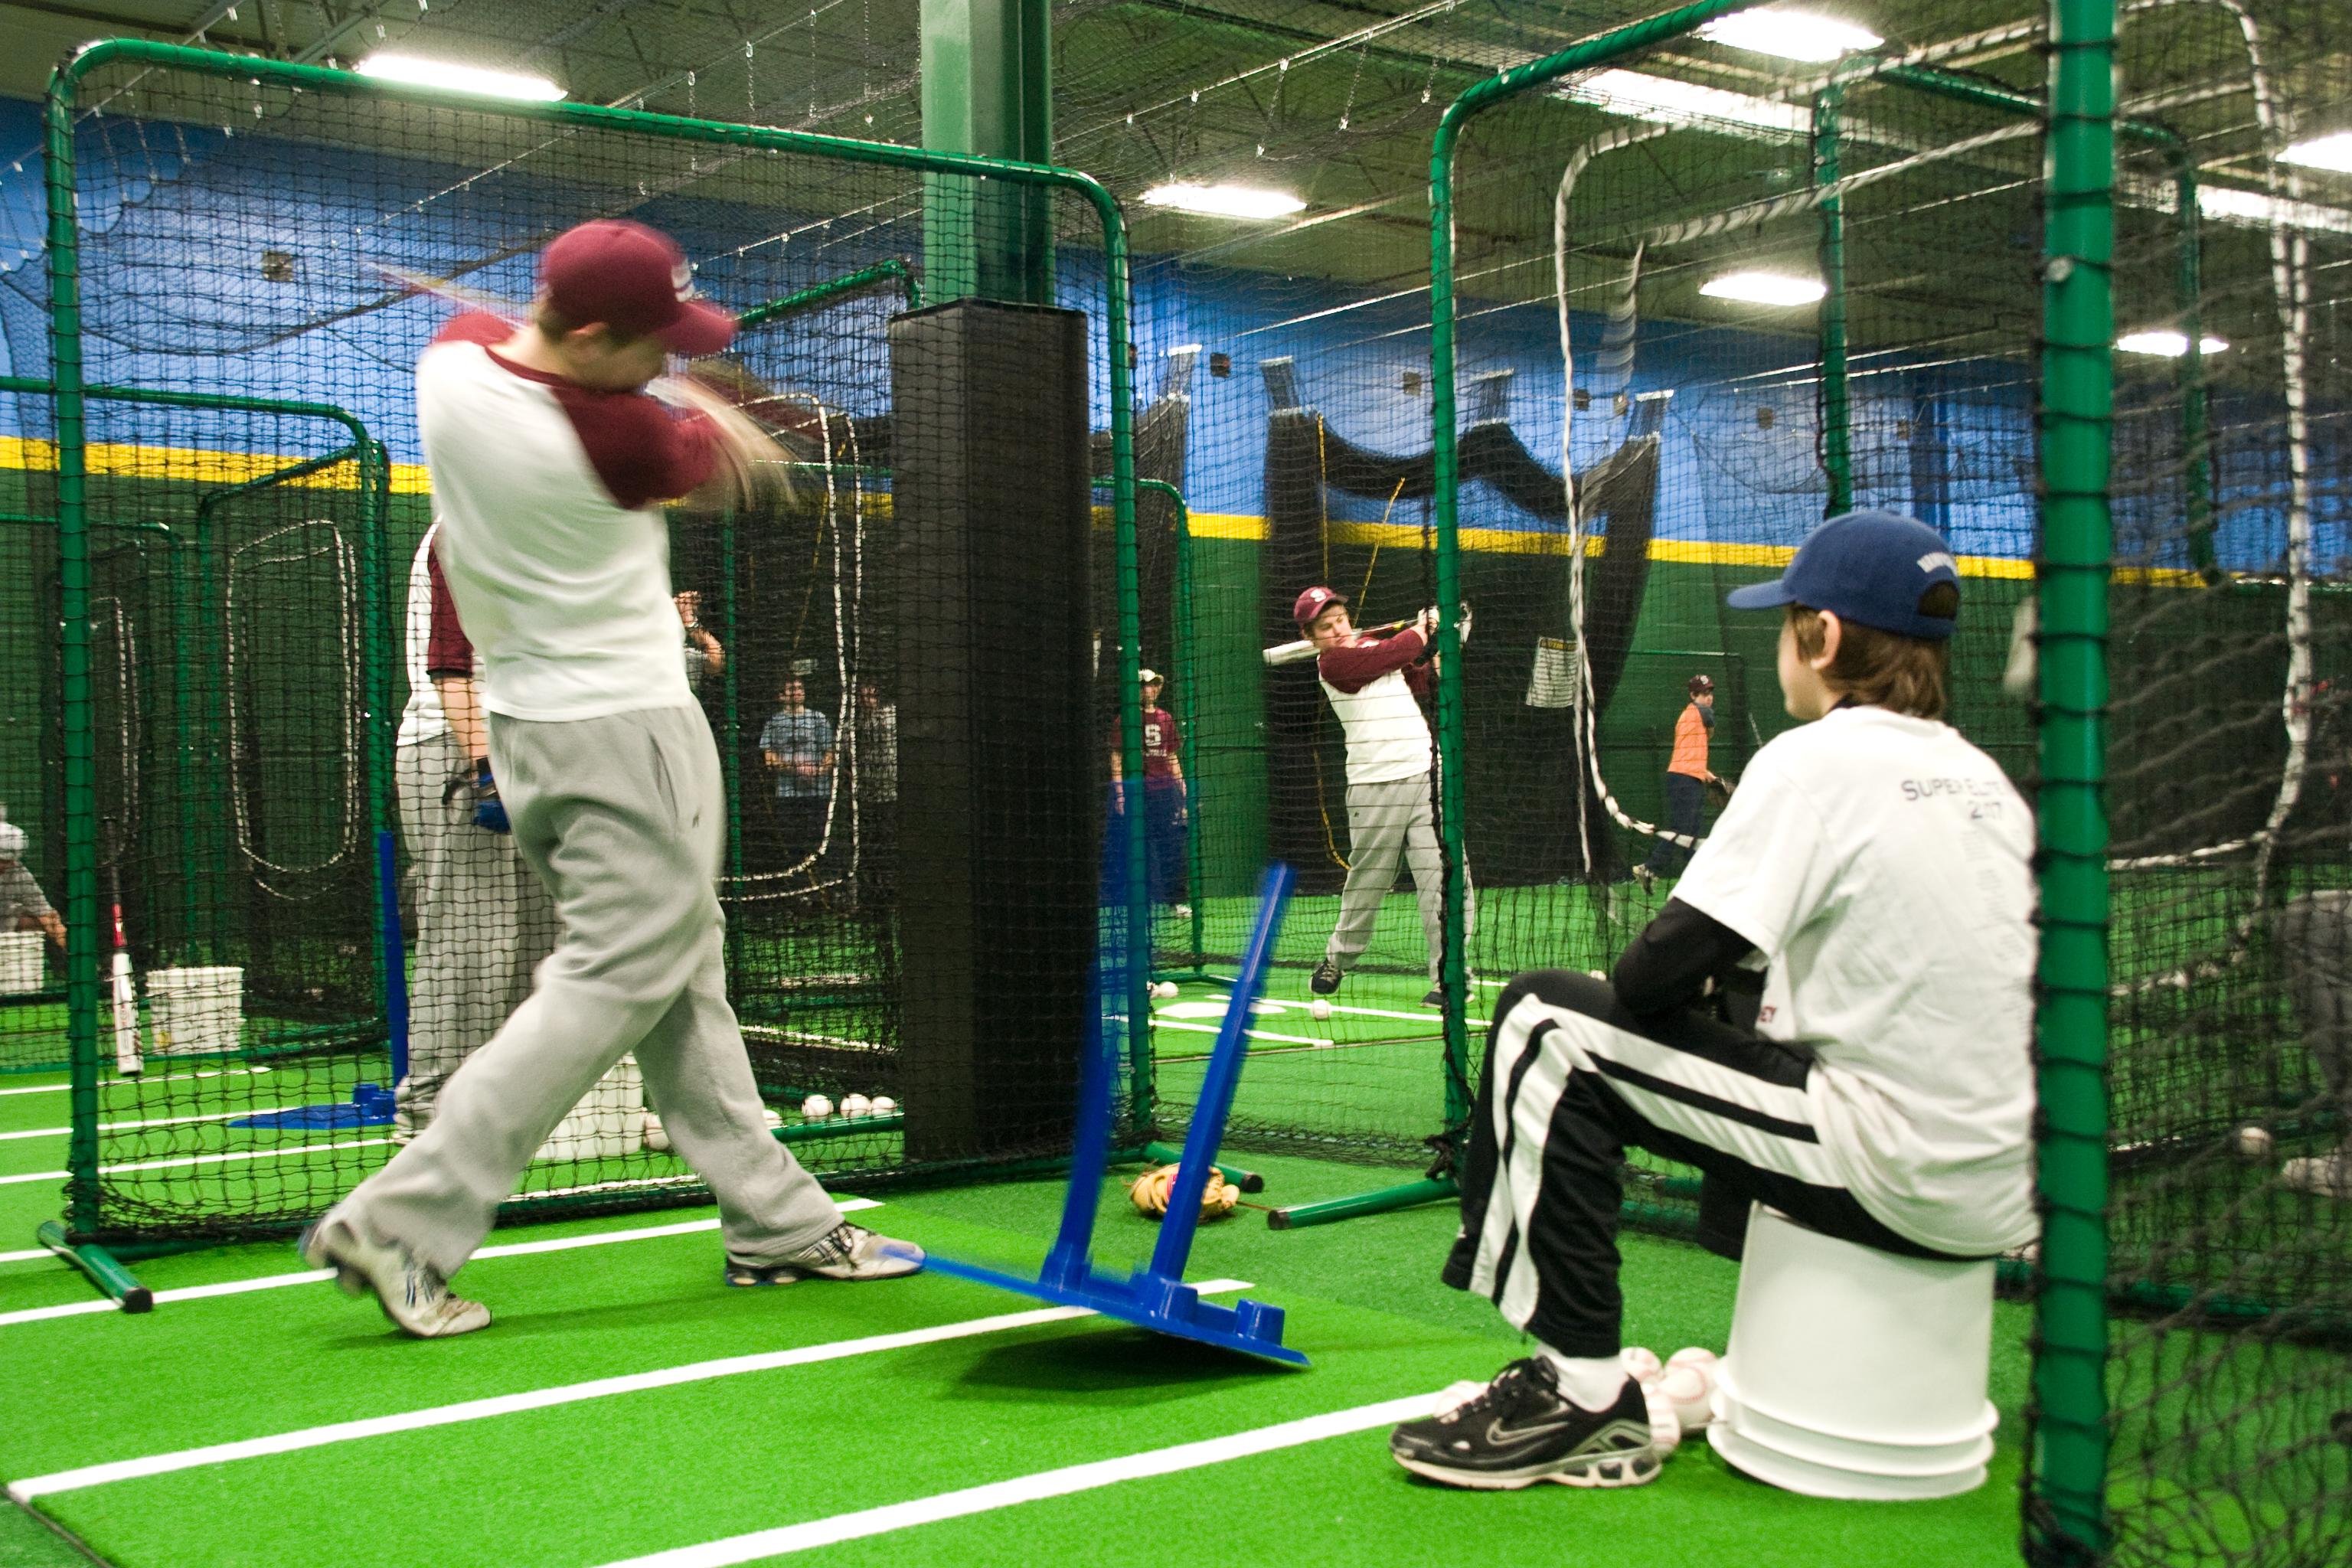 Batting cages hilton head